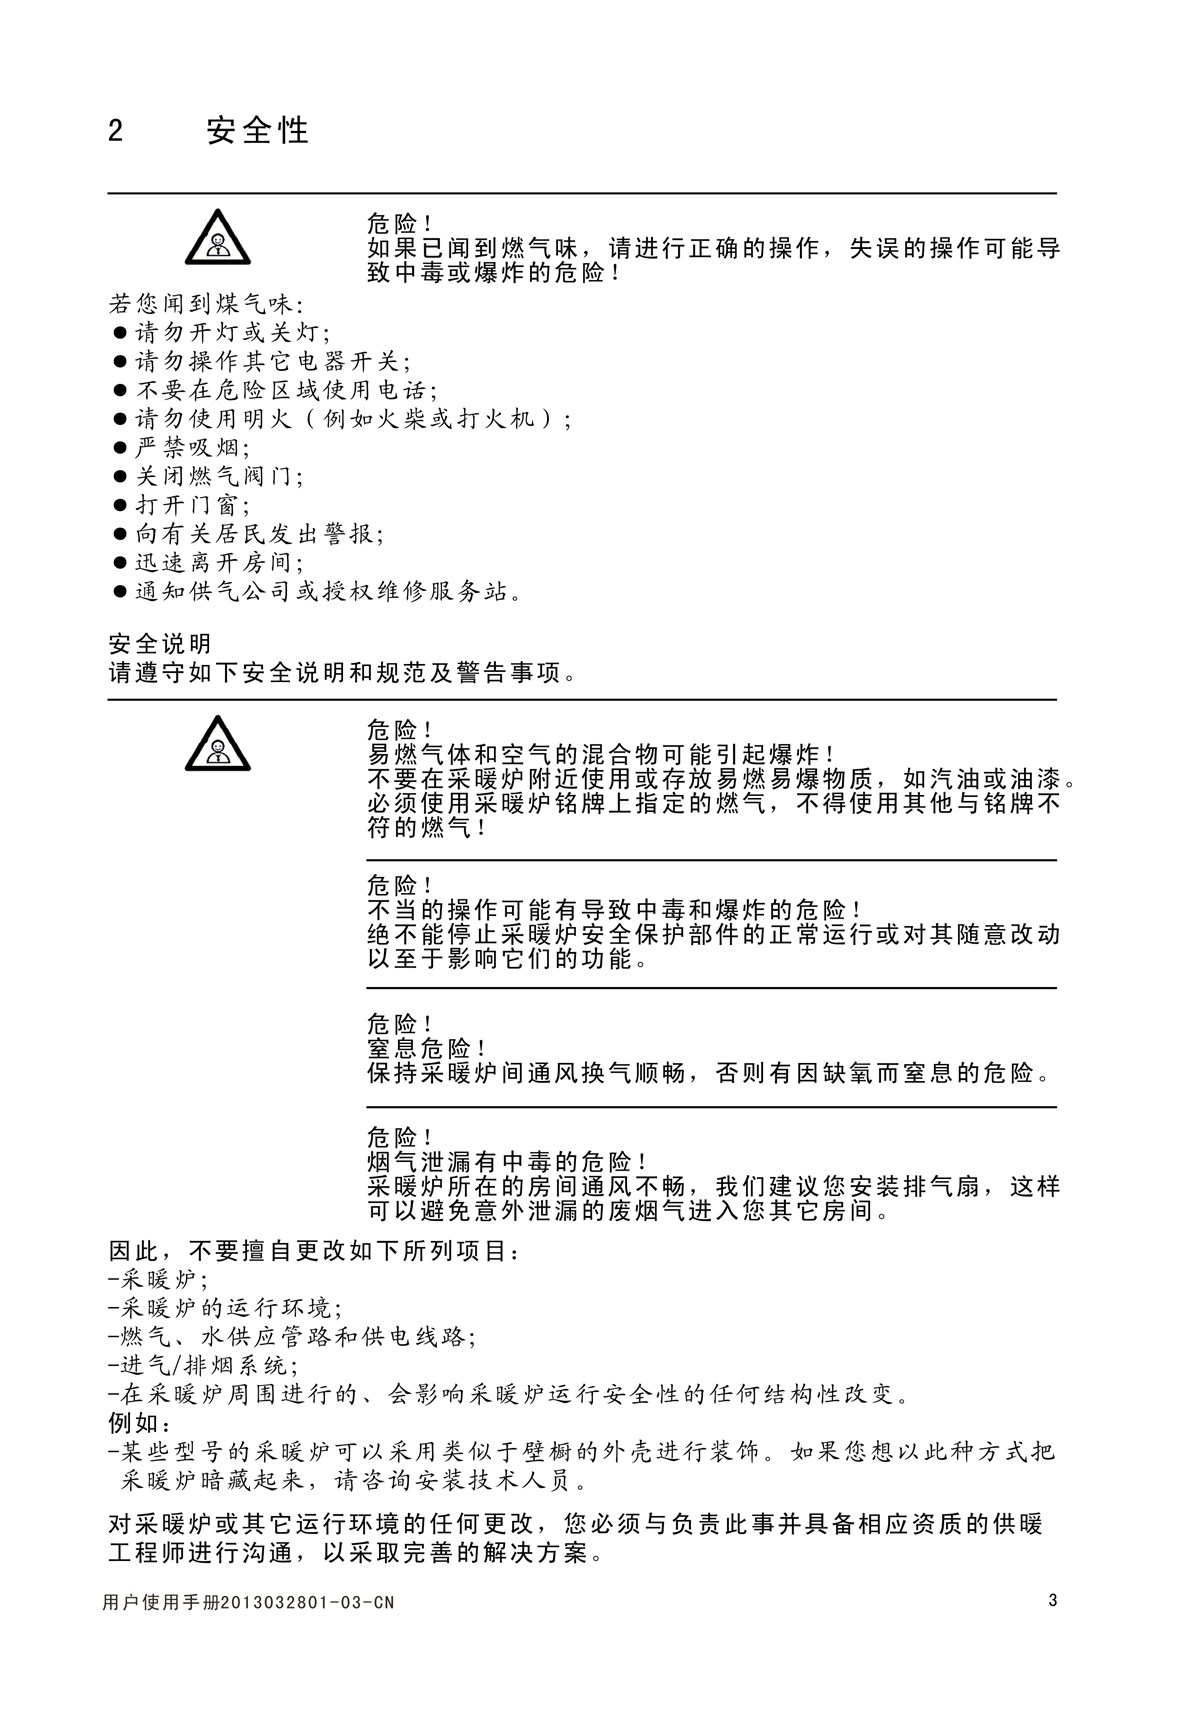 ES16B系列-用户使用手册-4_02.jpg